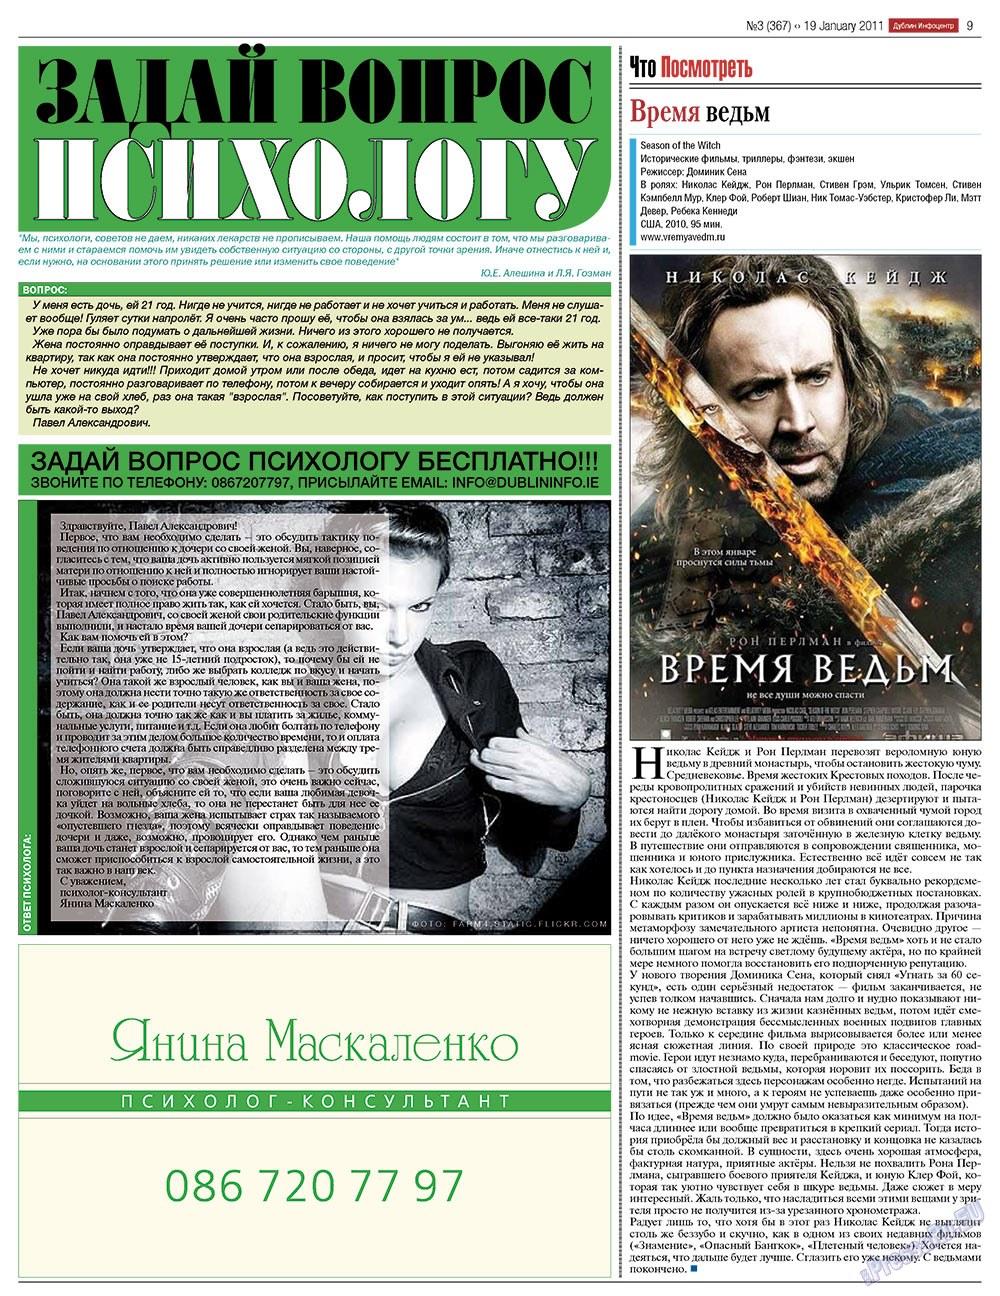 Дублин инфоцентр (газета). 2011 год, номер 3, стр. 9